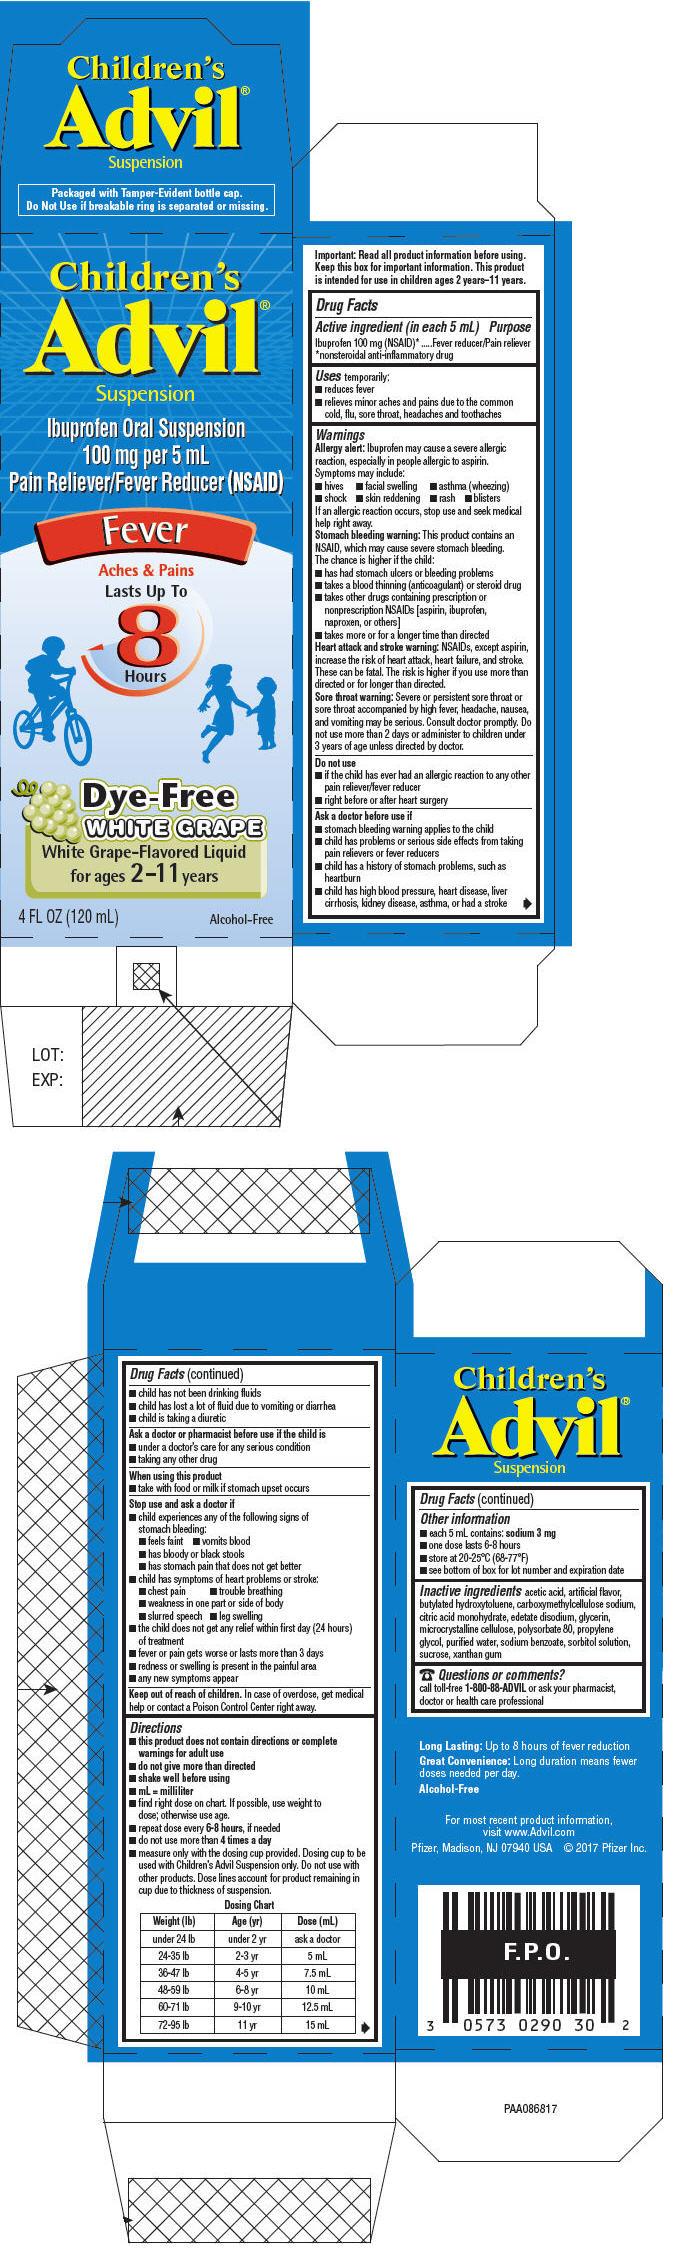 PRINCIPAL DISPLAY PANEL - 120 mL Bottle Carton - White Grape-Flavored